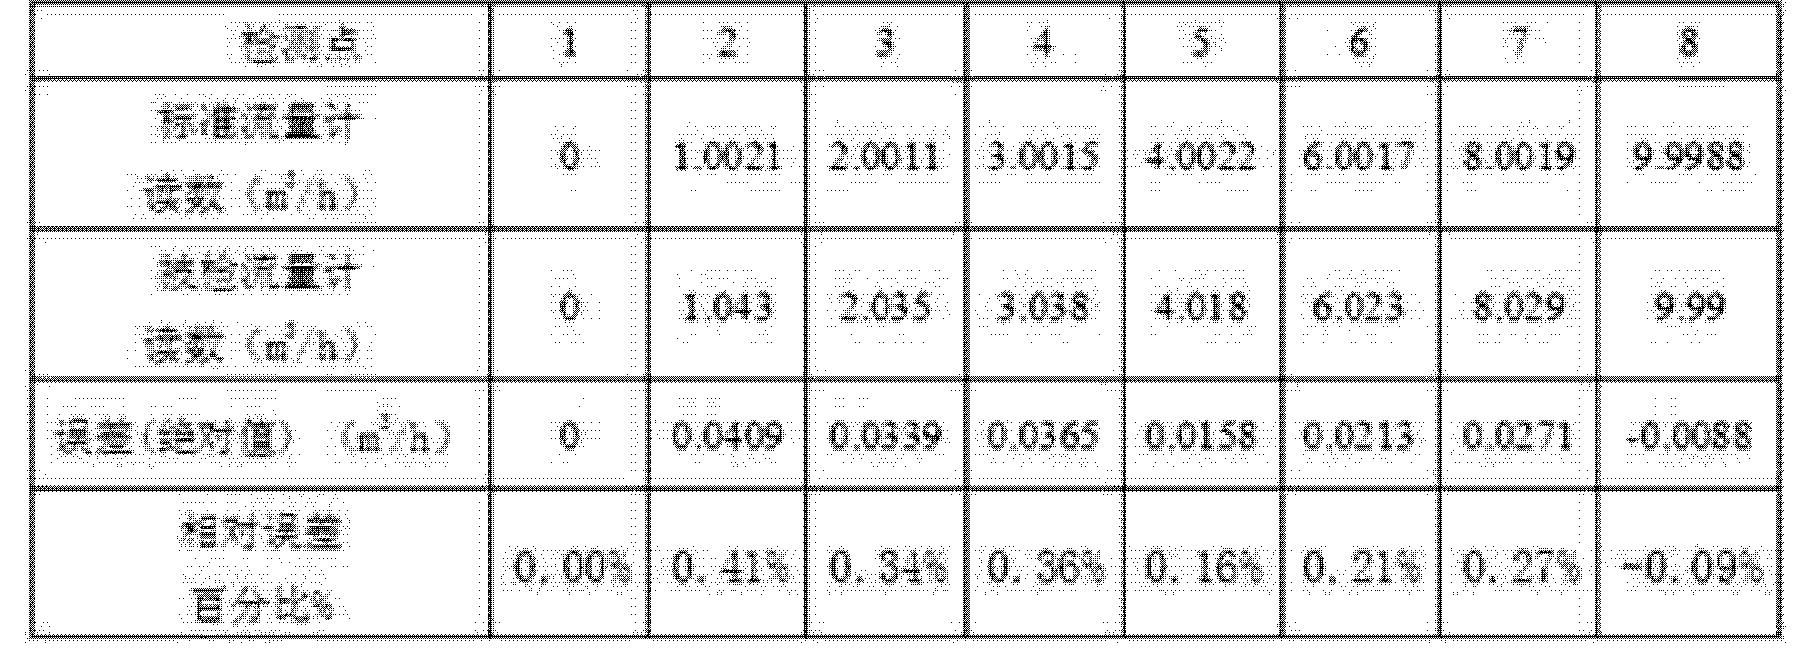 Figure CN204115829UD00061